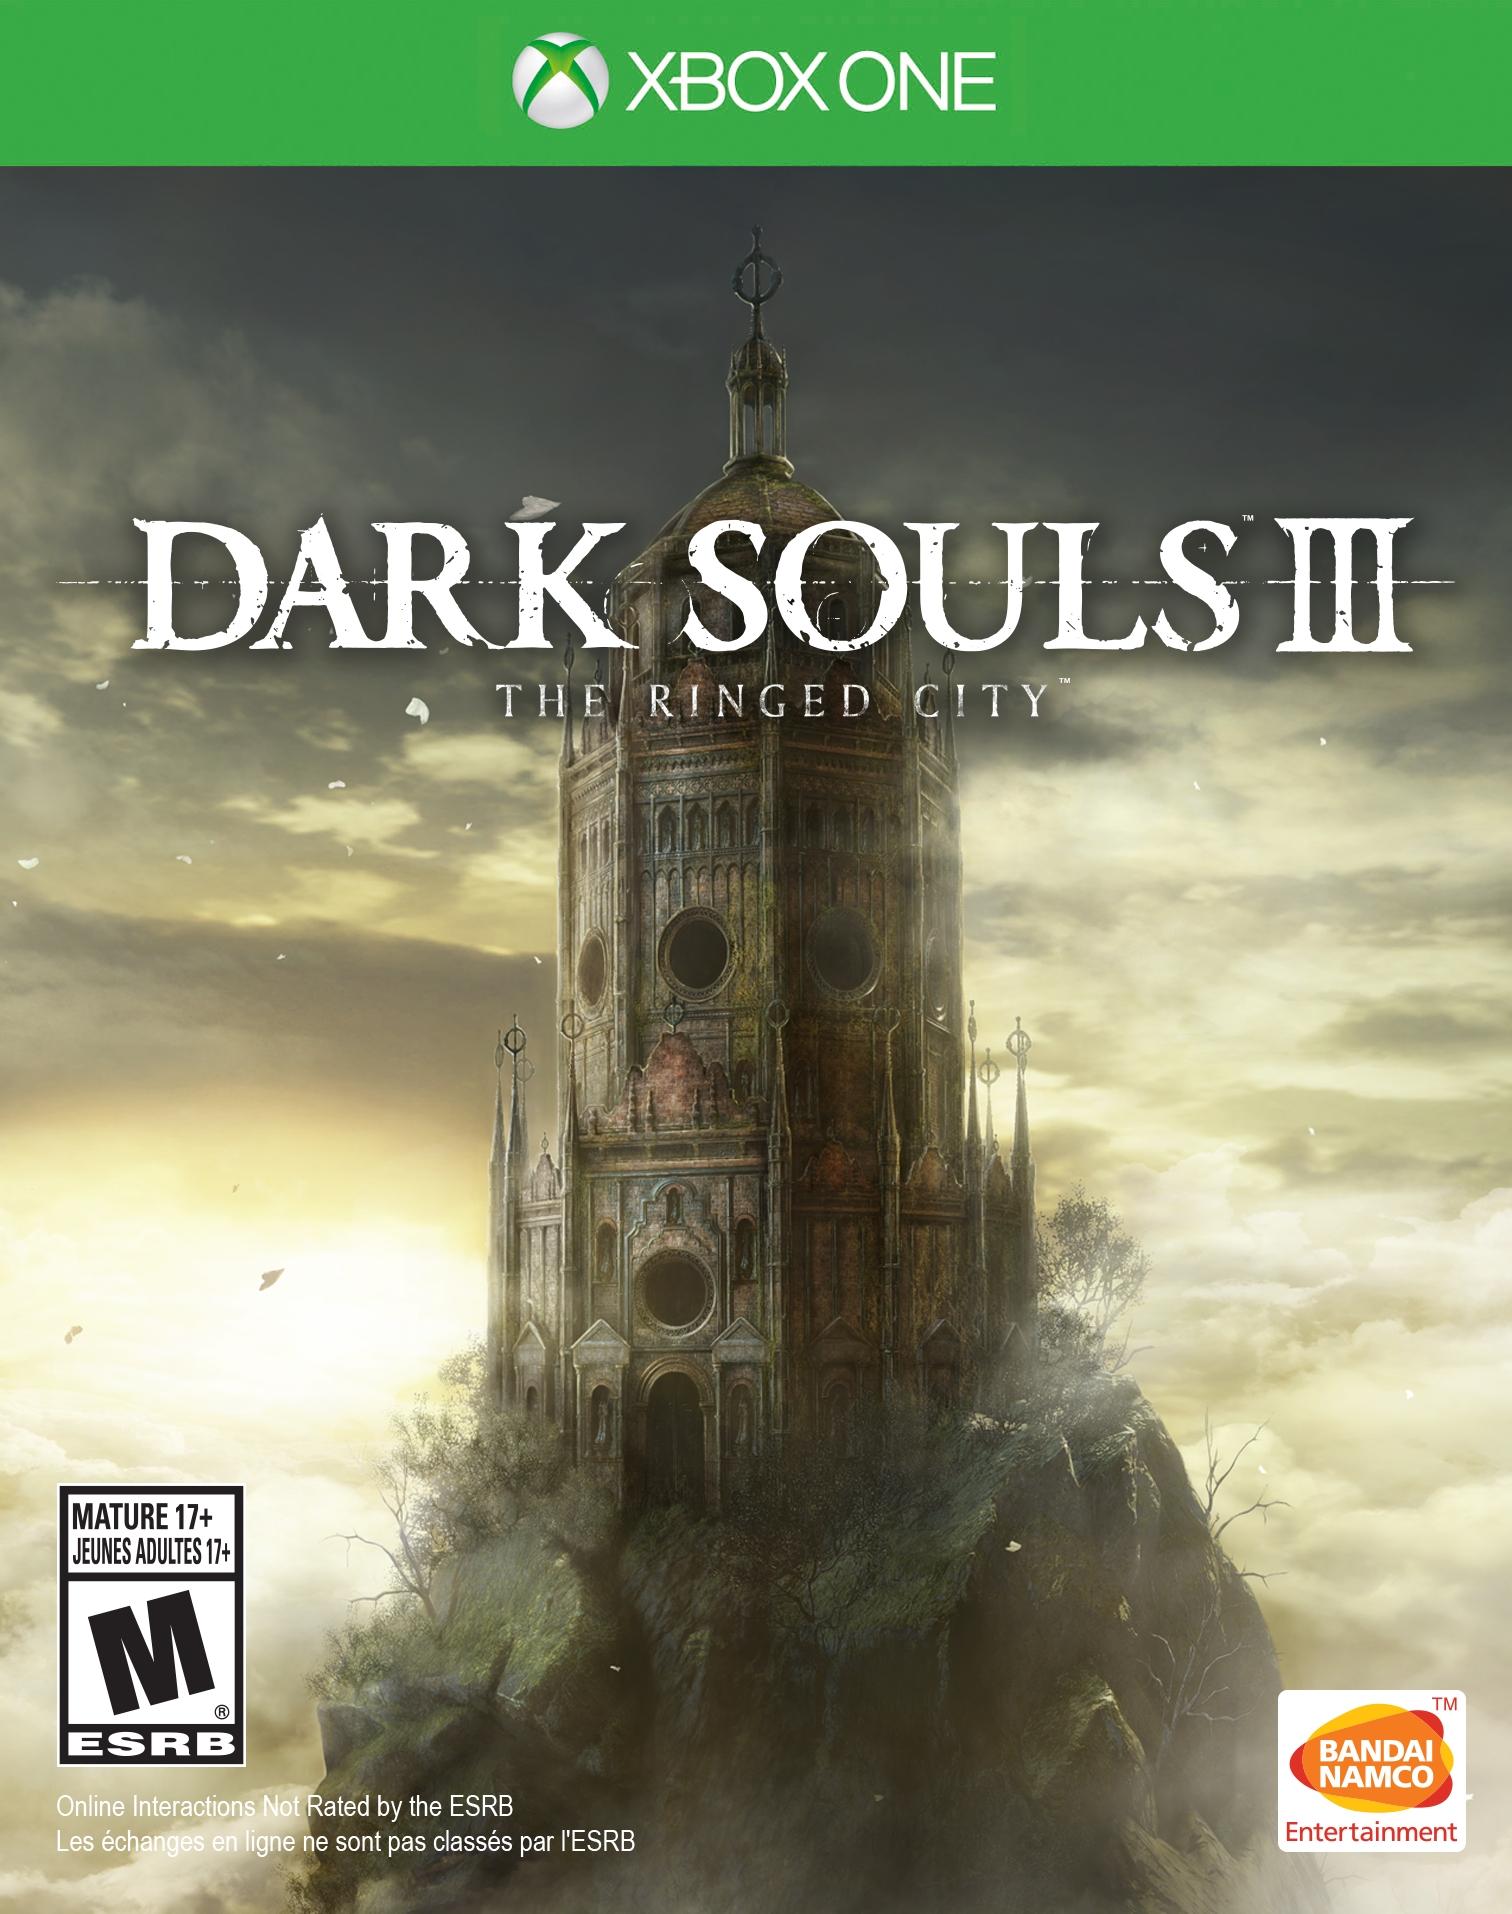 Dark Souls III The Ringed City Xbox One Boxart